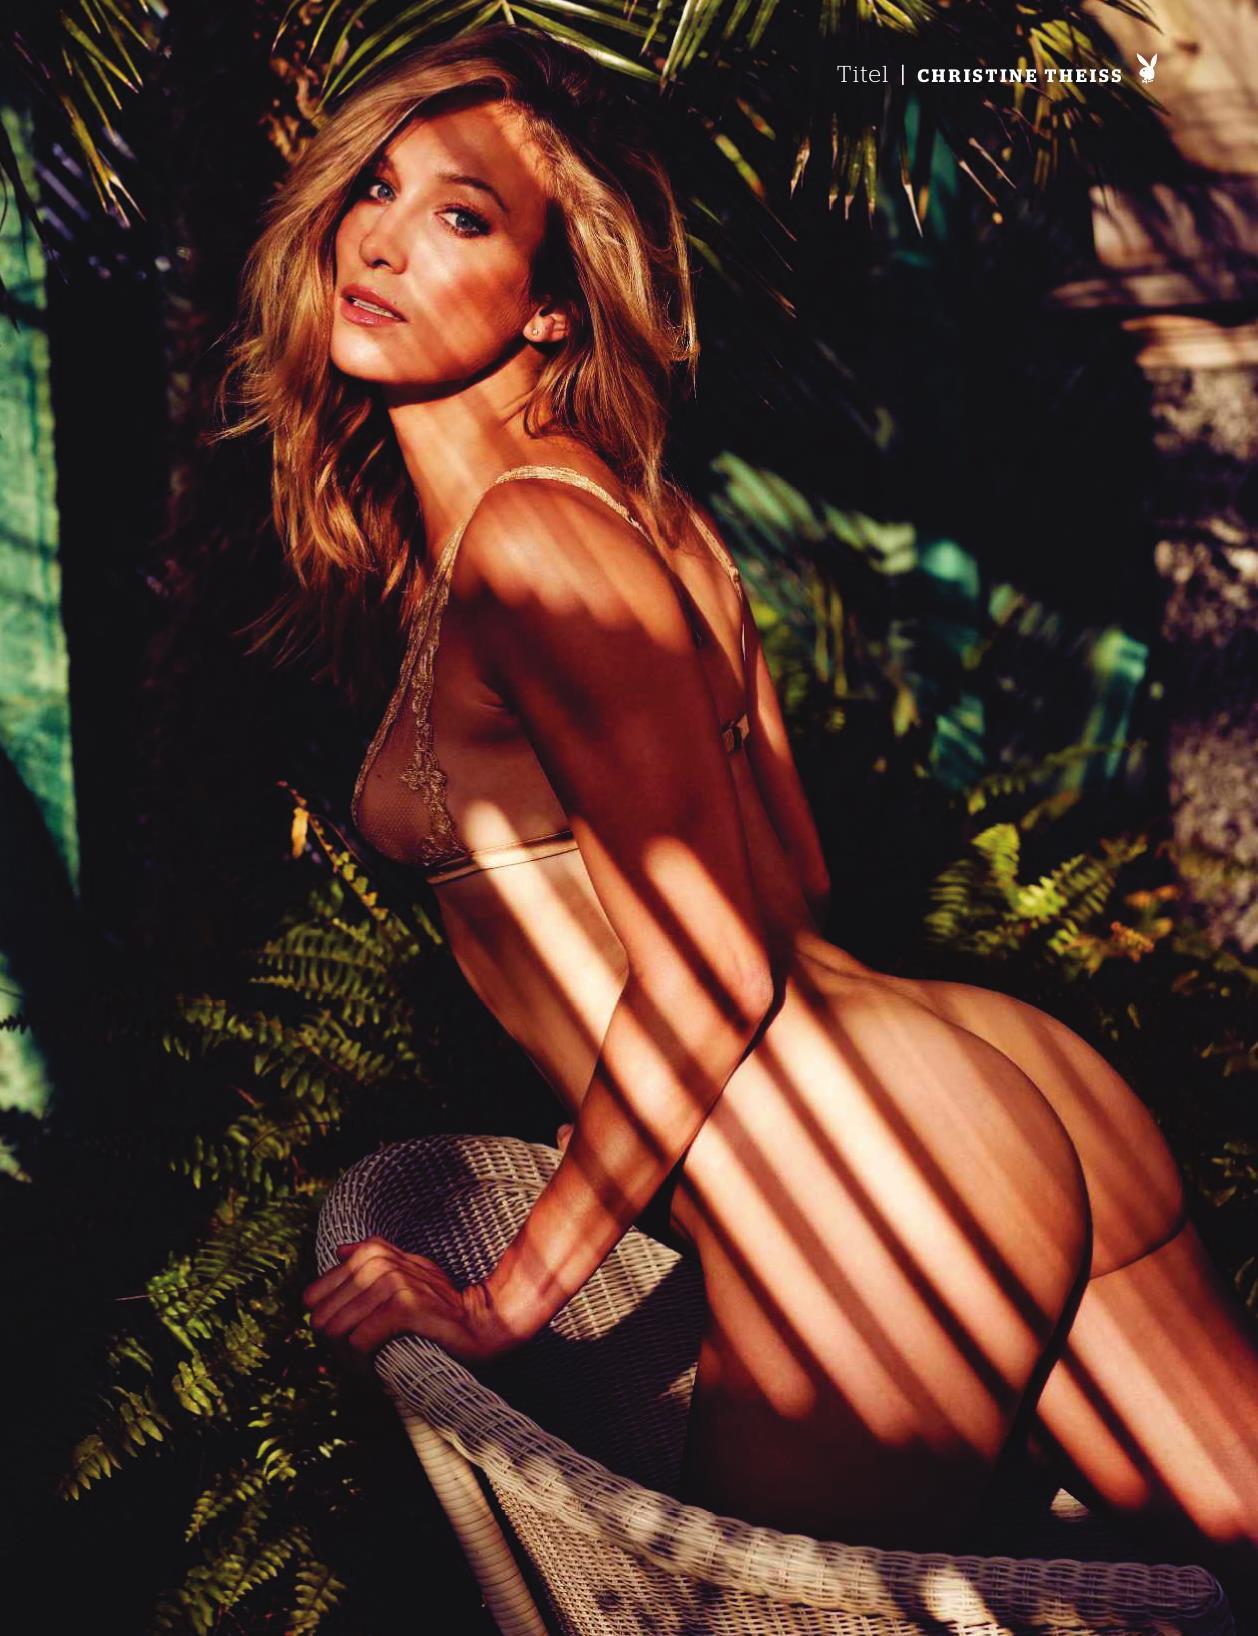 Кристин Тэйсс голая. Фото - 20